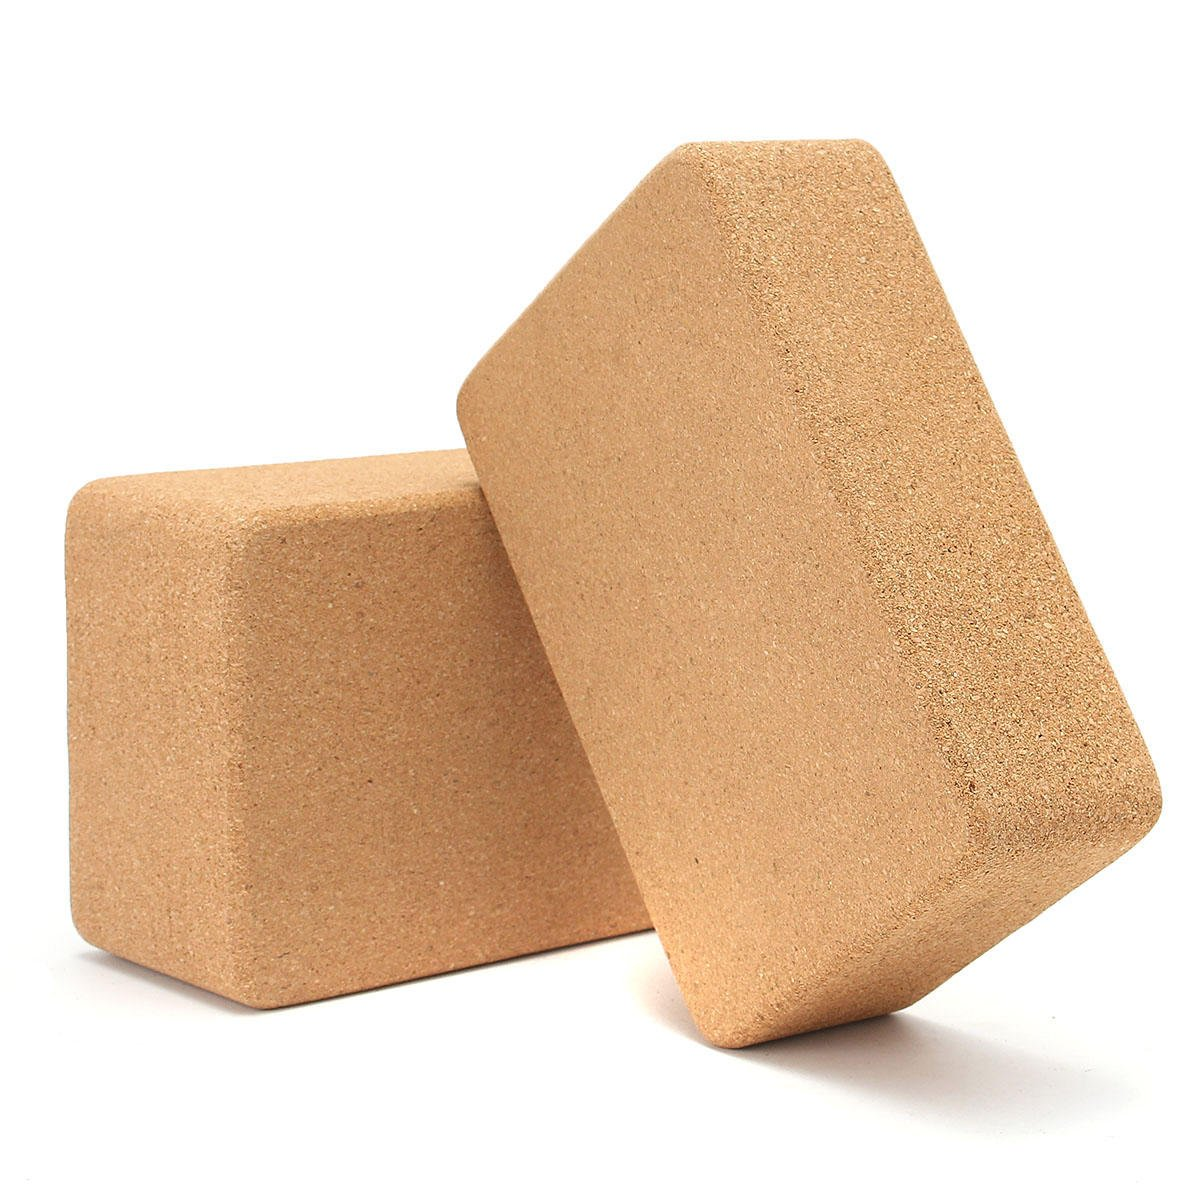 Yoga Cork Block Home Stretch Gym Fitness Exercise Pilates ...